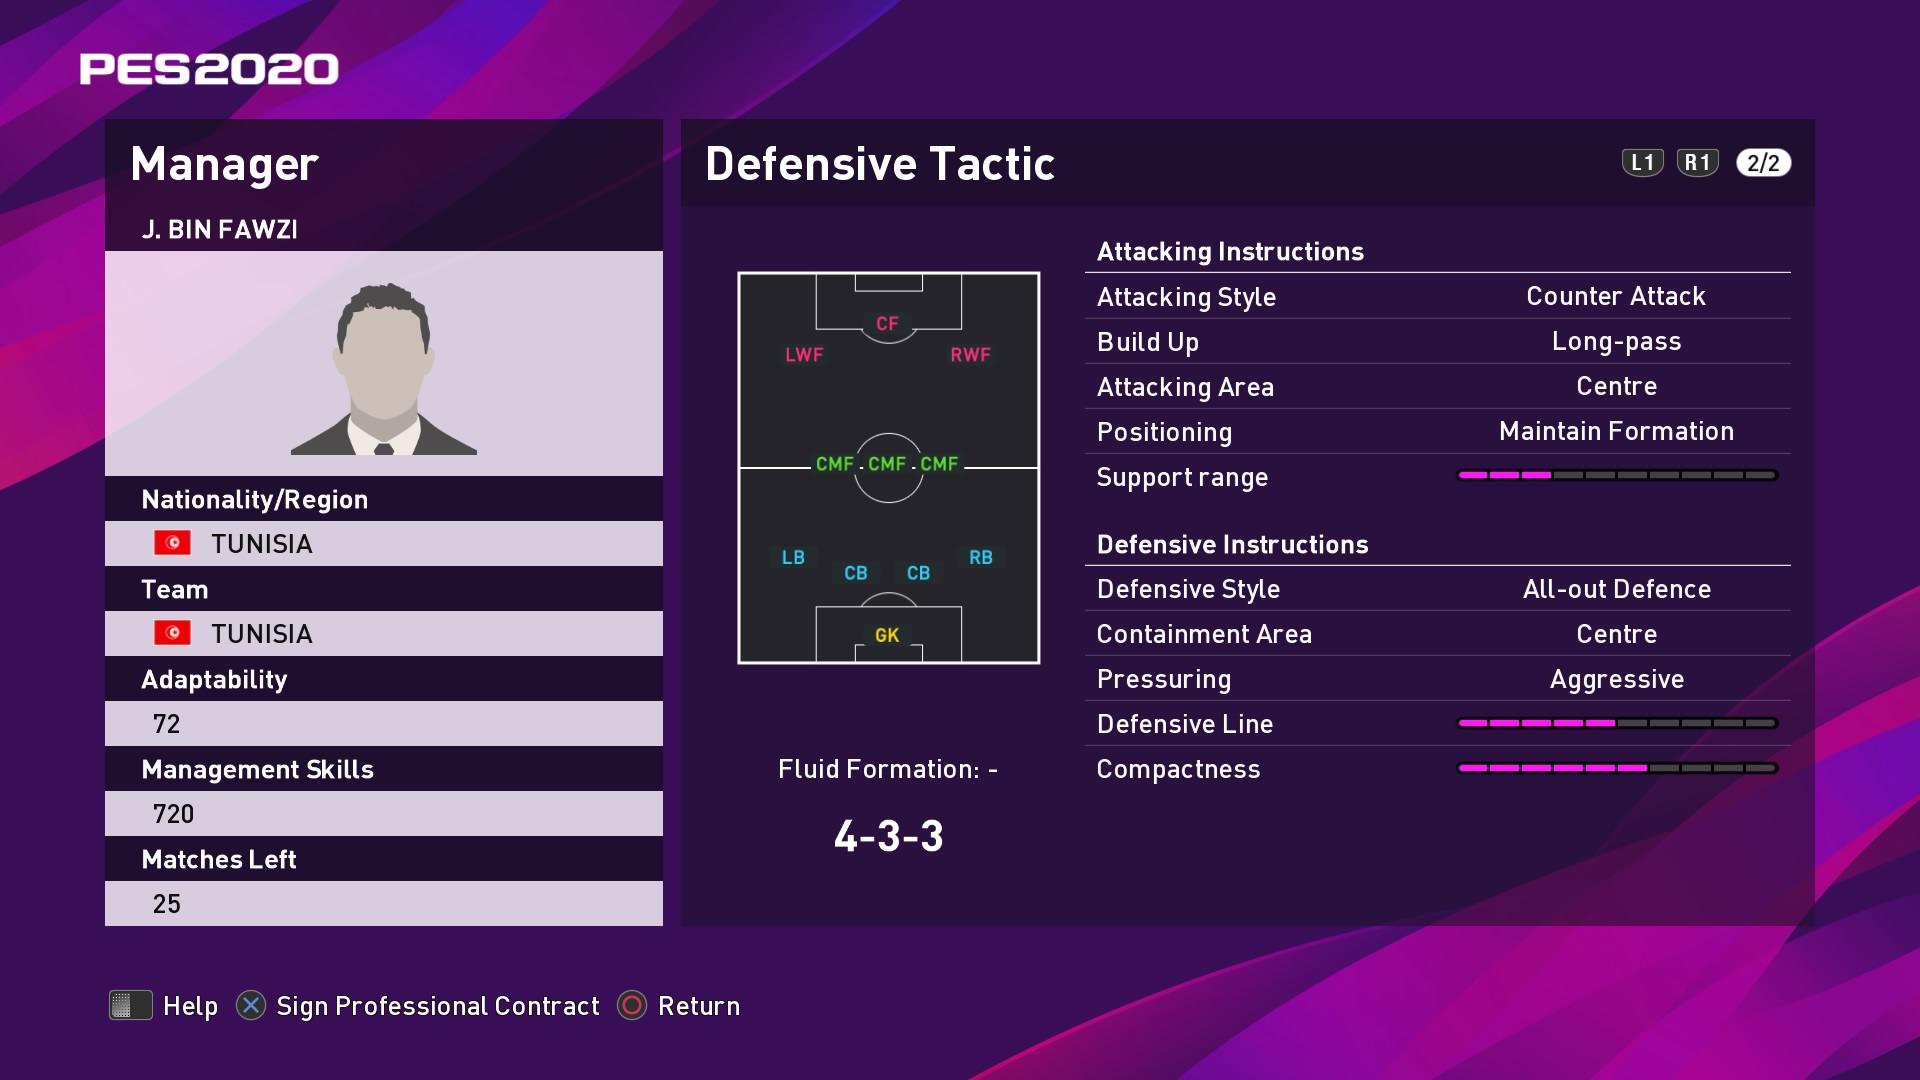 J. Bin Fawzi (Mondher Kebaier) Defensive Tactic in PES 2020 myClub